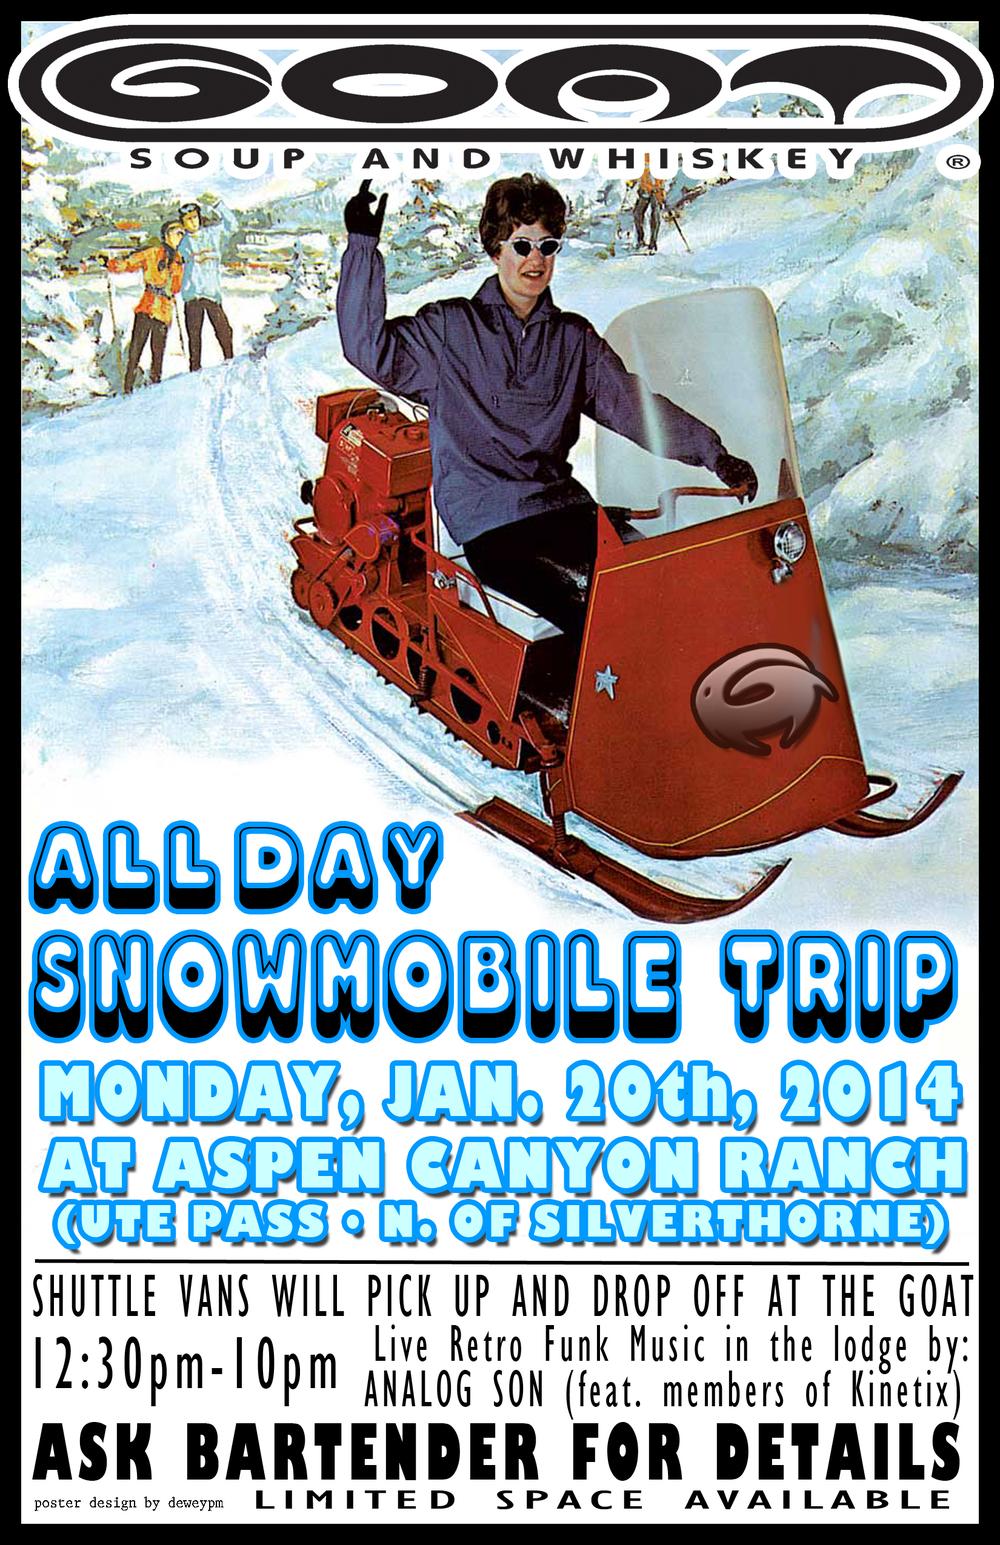 snowmobile2014.jpg